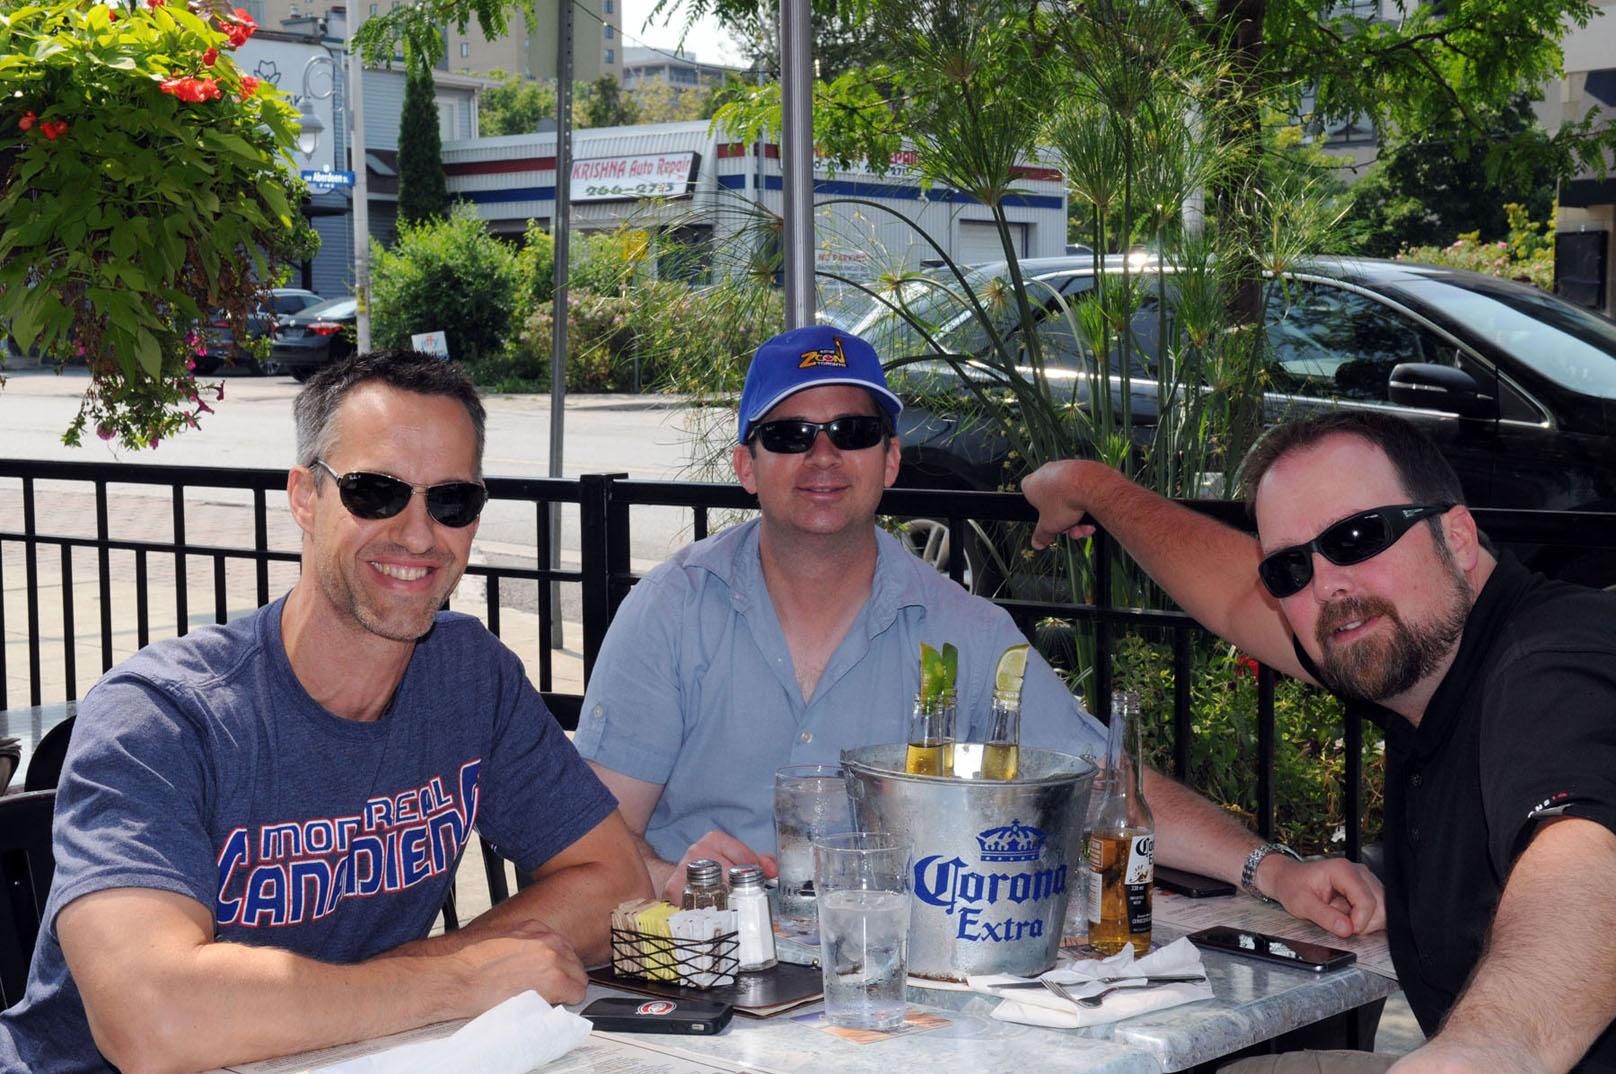 Ottawa good times